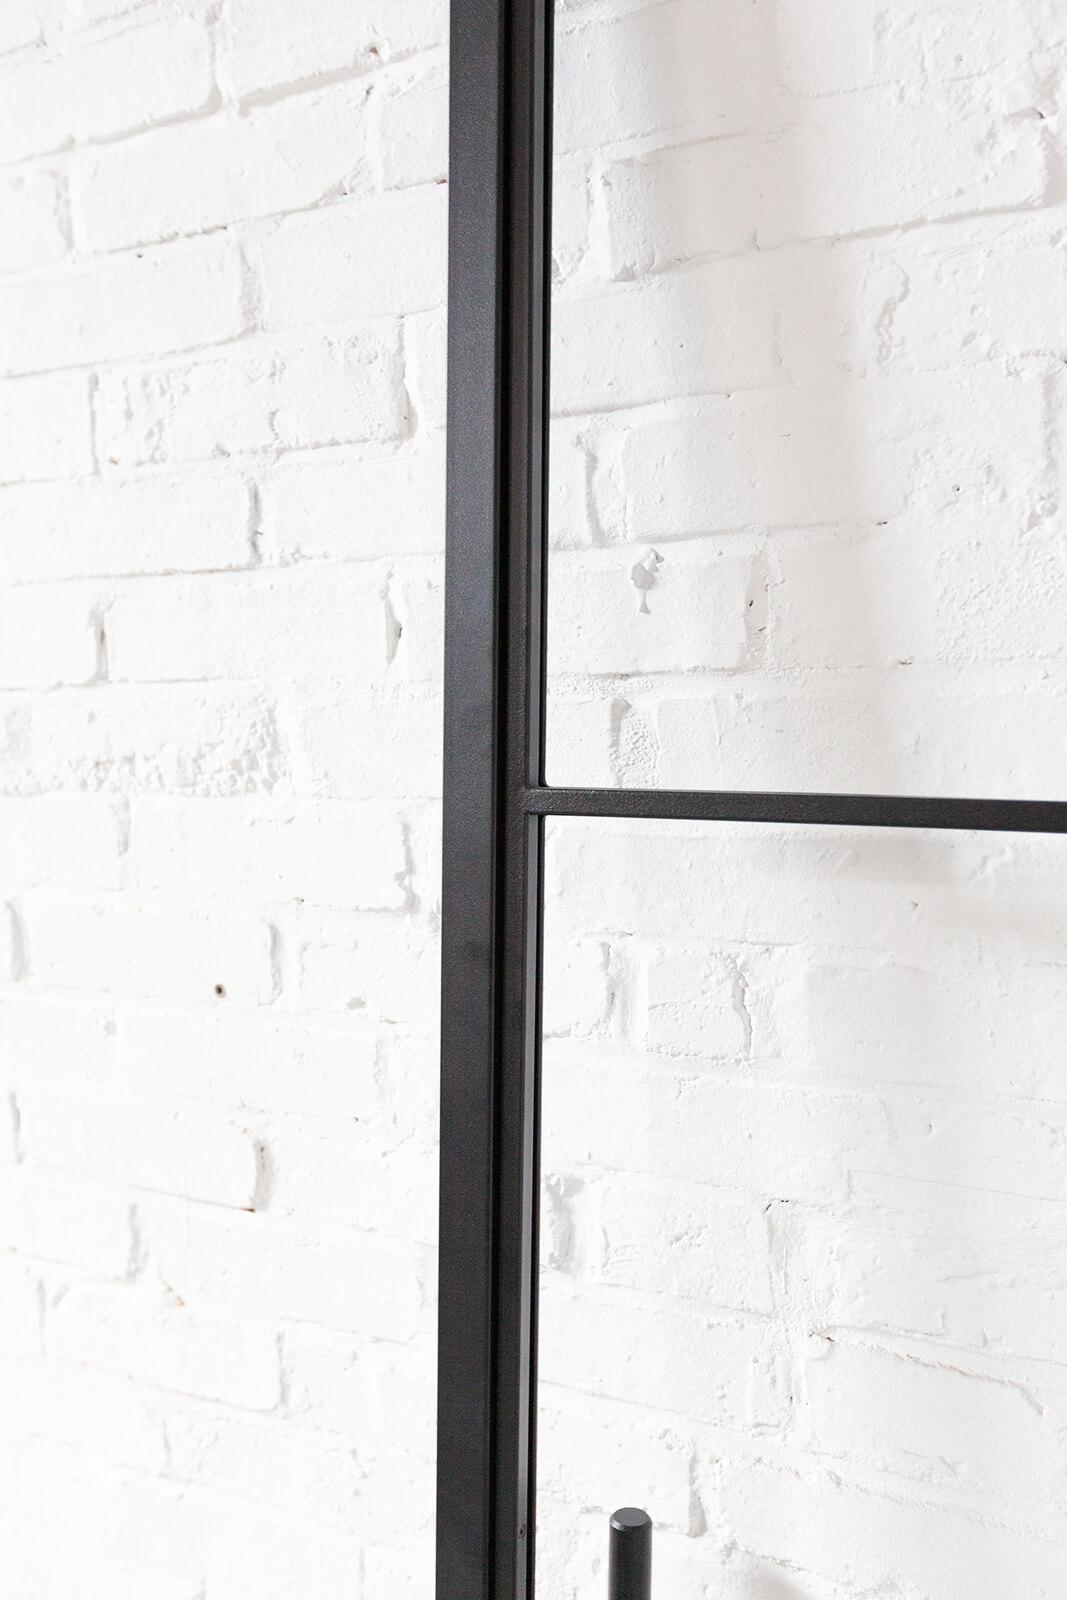 N51E12 Design Stahl Loft Schiebetür, Schiebetüren, Raumtrenner, Windfang, Glastrennwand, Trennwand, Bauhaus Design, Bauhaus Tür, Industrial Door, steel door